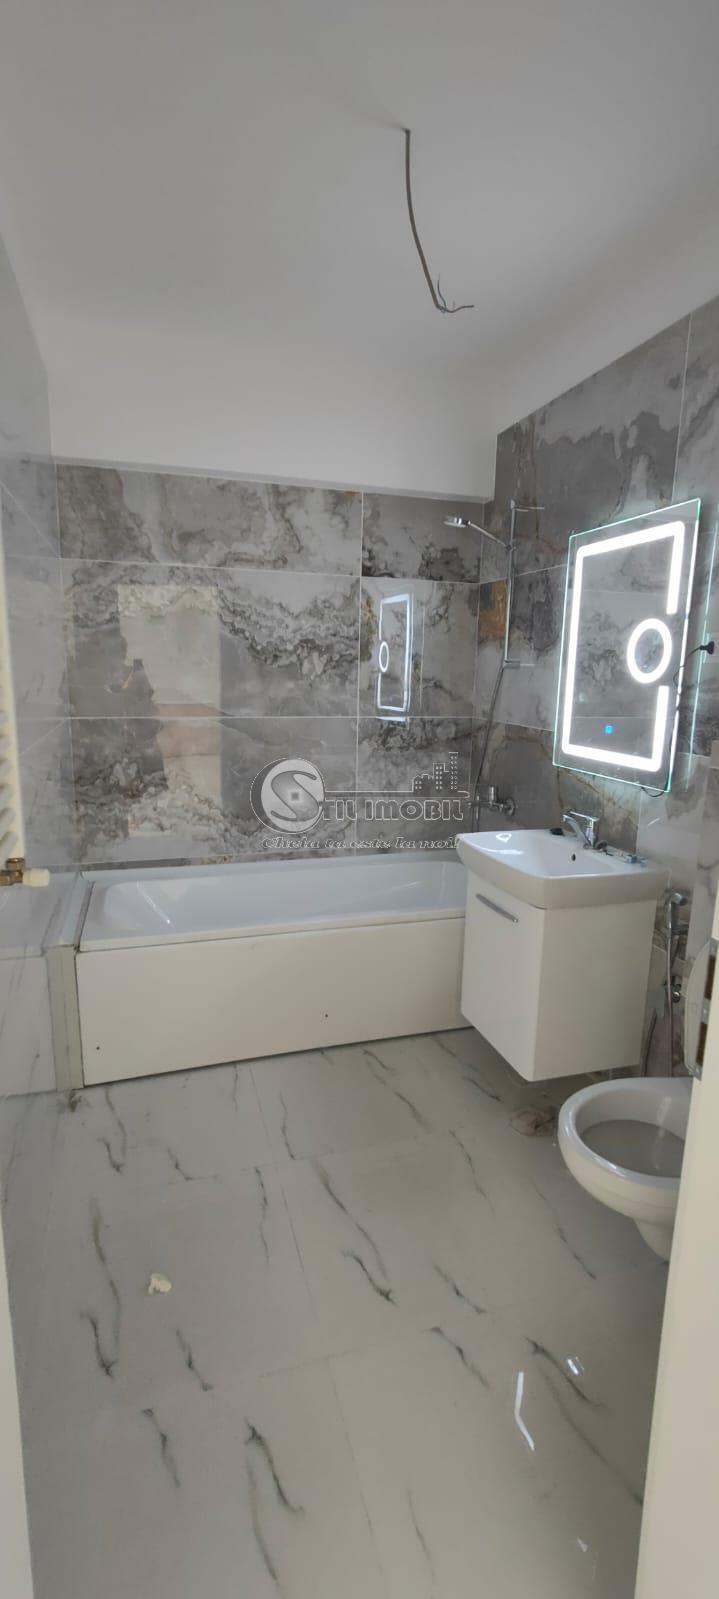 Apartament 2 camere open 38mp, Tatarasi Kaufland nou